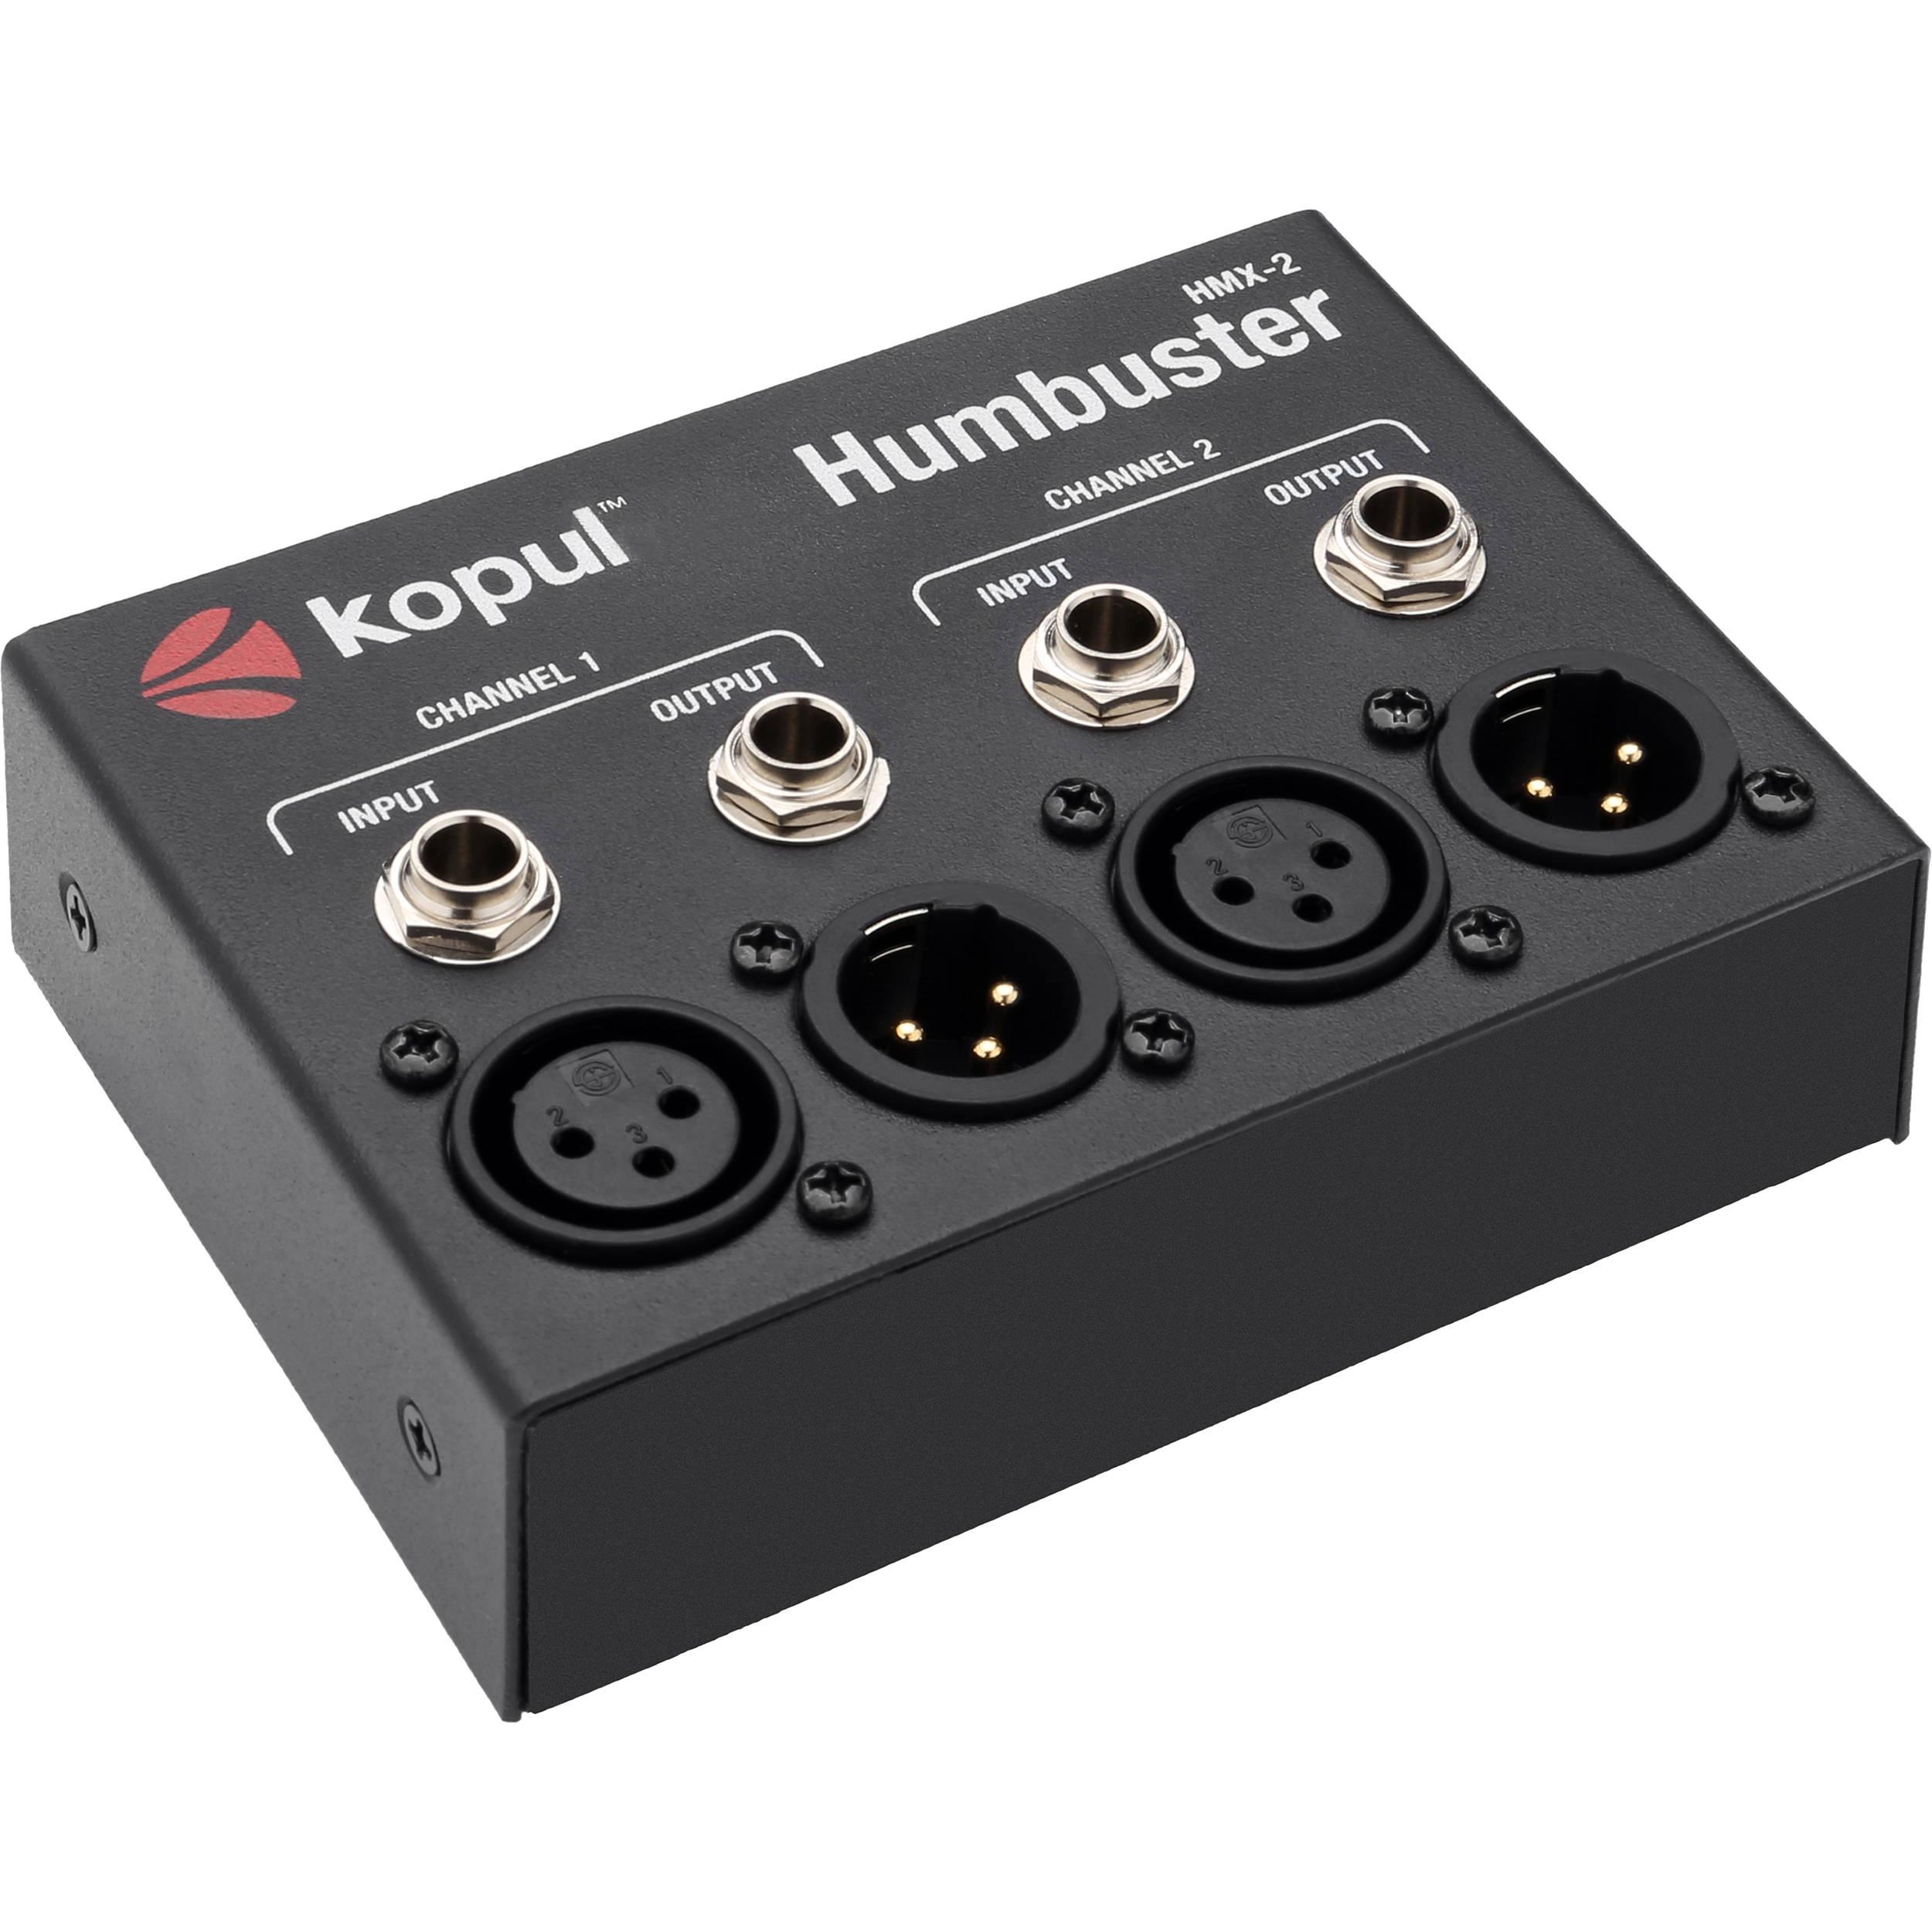 Kopul Hmx 2 Humbuster Dual Channel Hum Eliminator Hmx 2 B Amp H